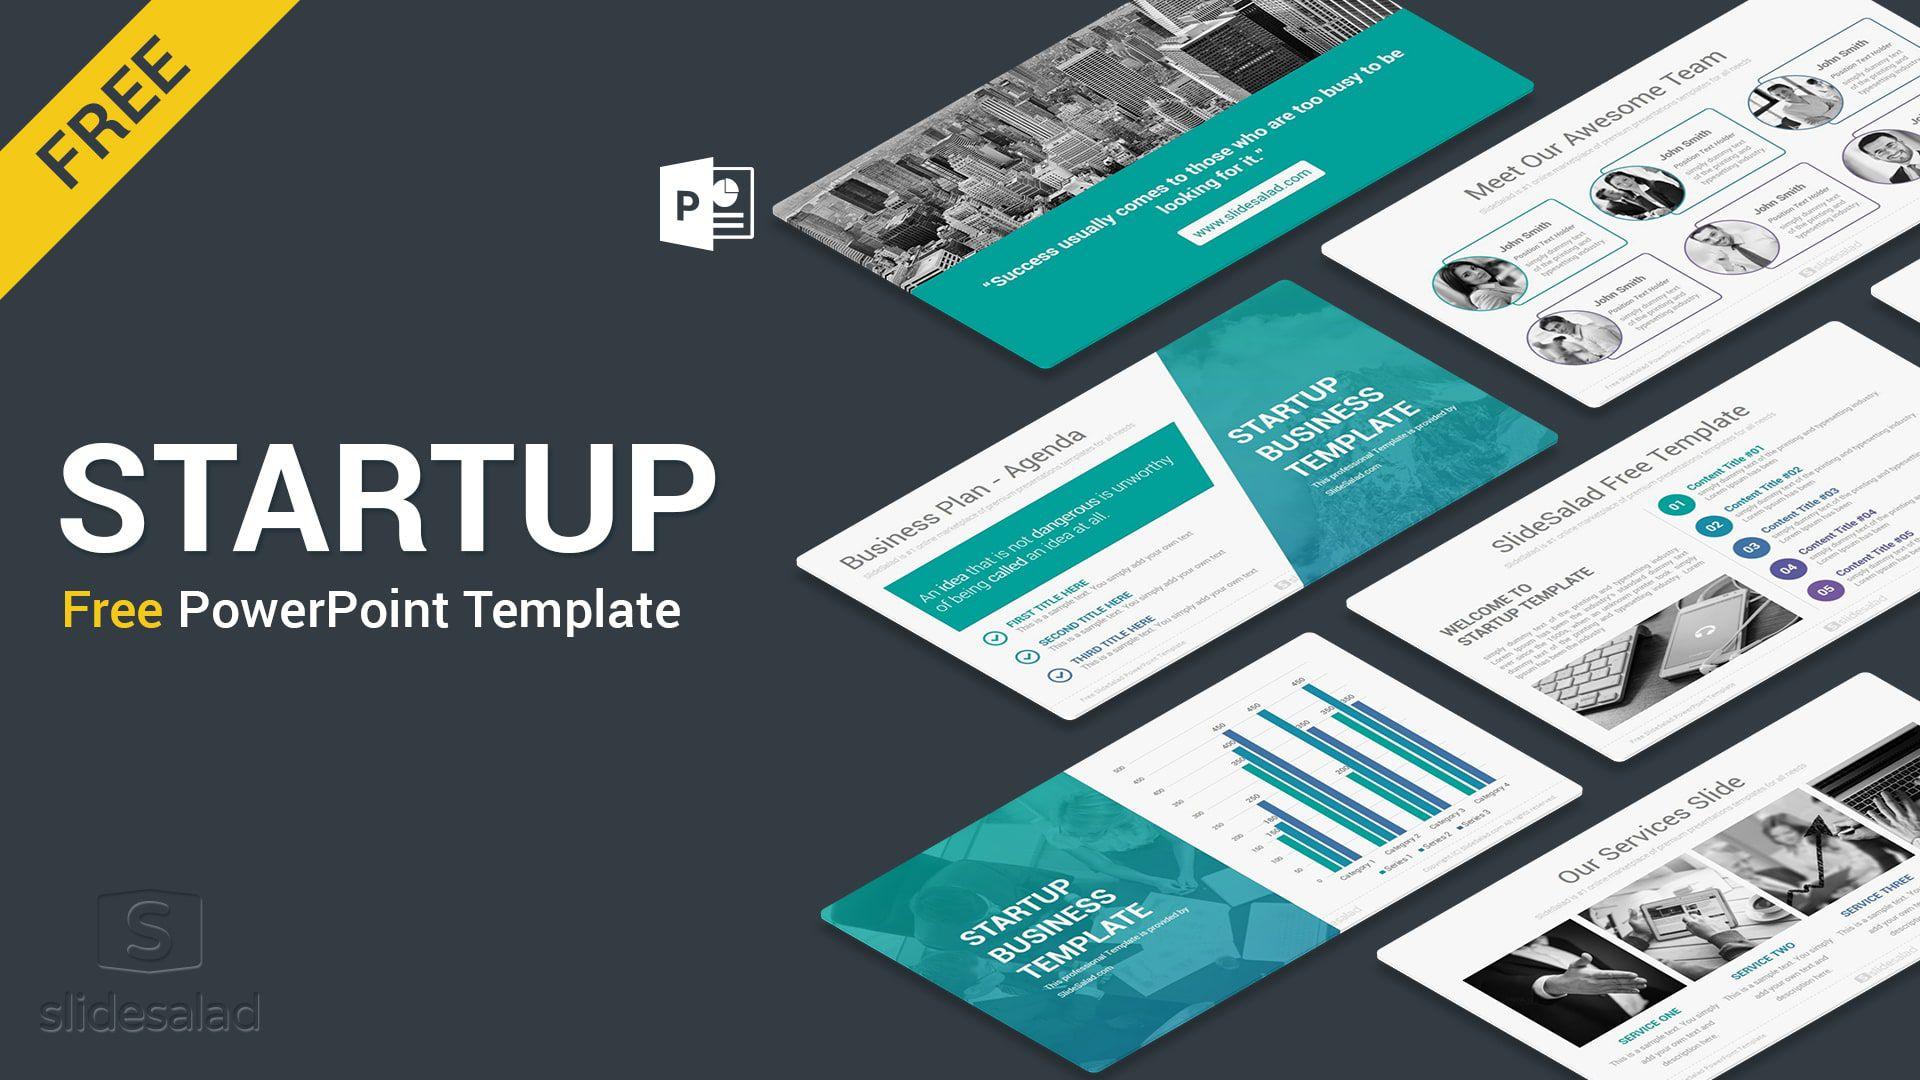 009 Impressive Free Busines Plan Template Ppt Sample  2020 Download Startup 30 60 90Full